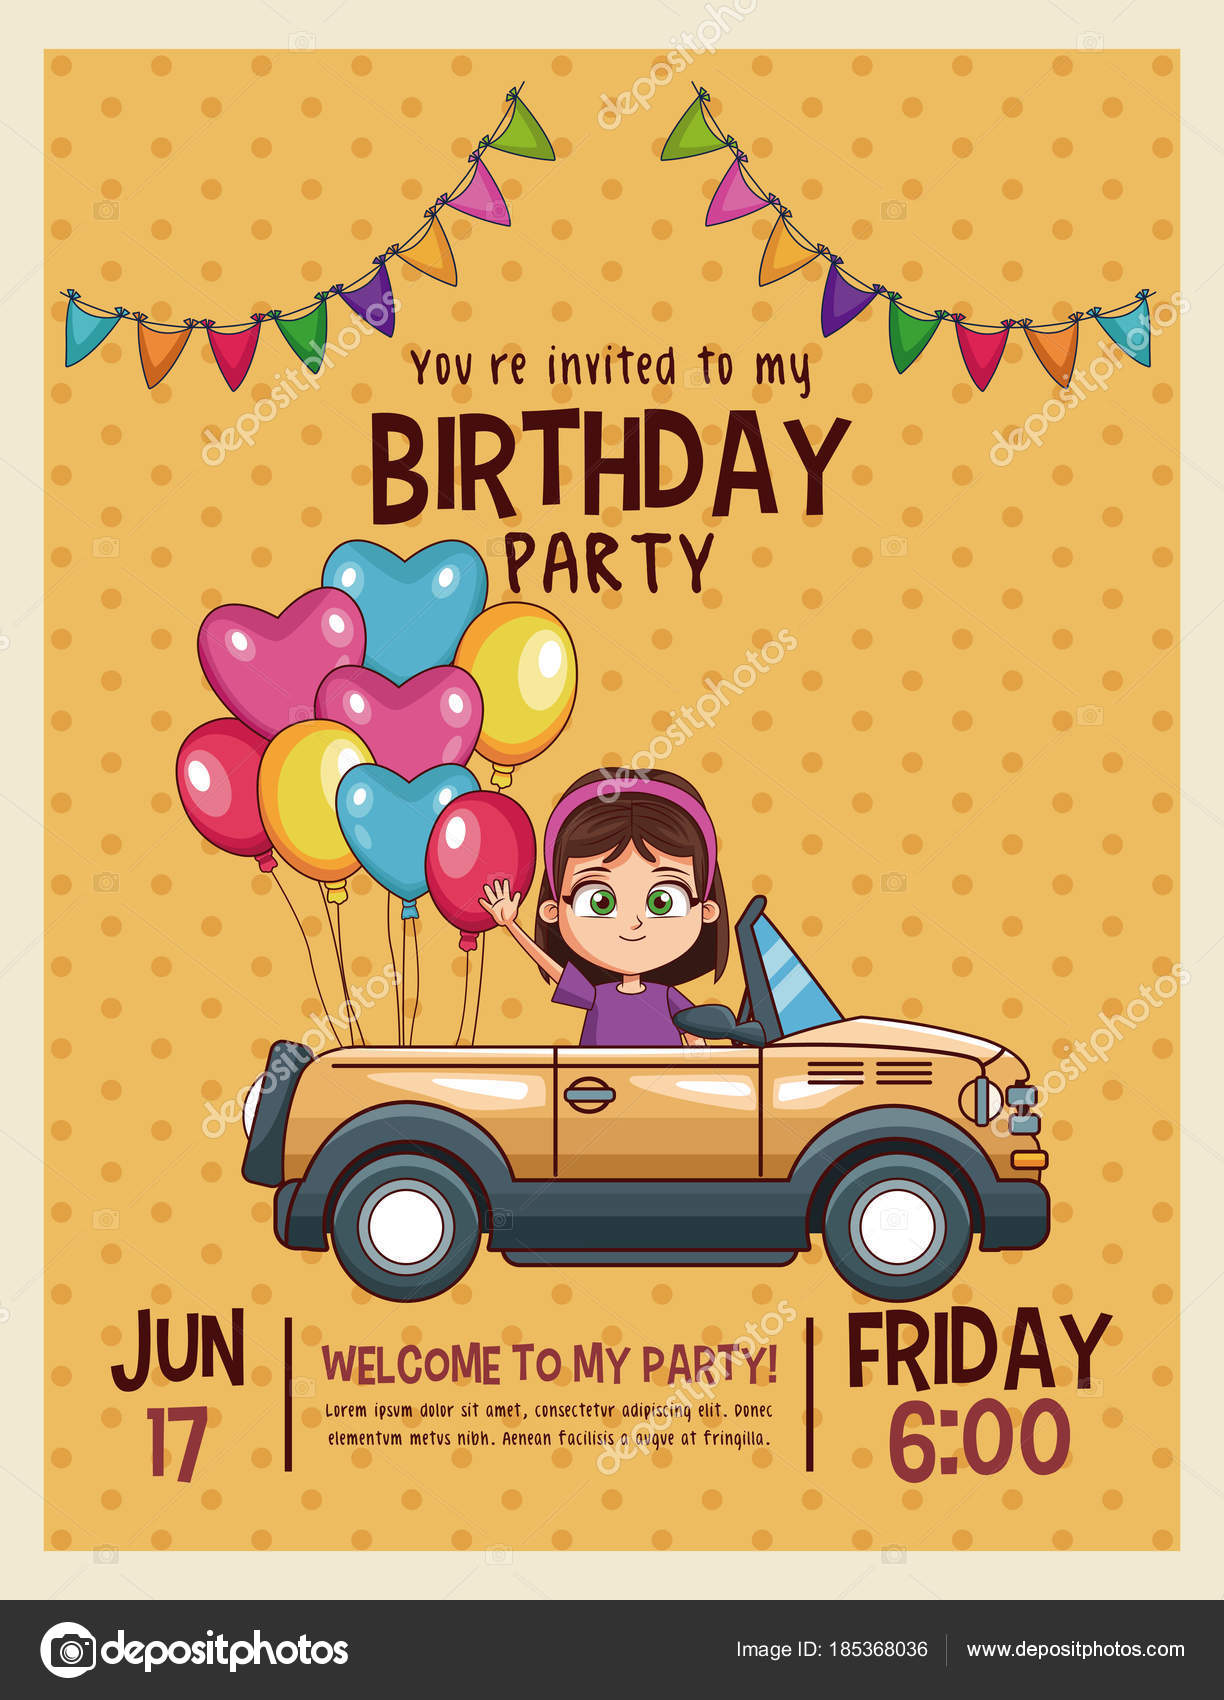 Kids birthday invitation card stock vector jemastock 185368036 kids birthday invitation card vector illustration graphic design vector by jemastock stopboris Choice Image